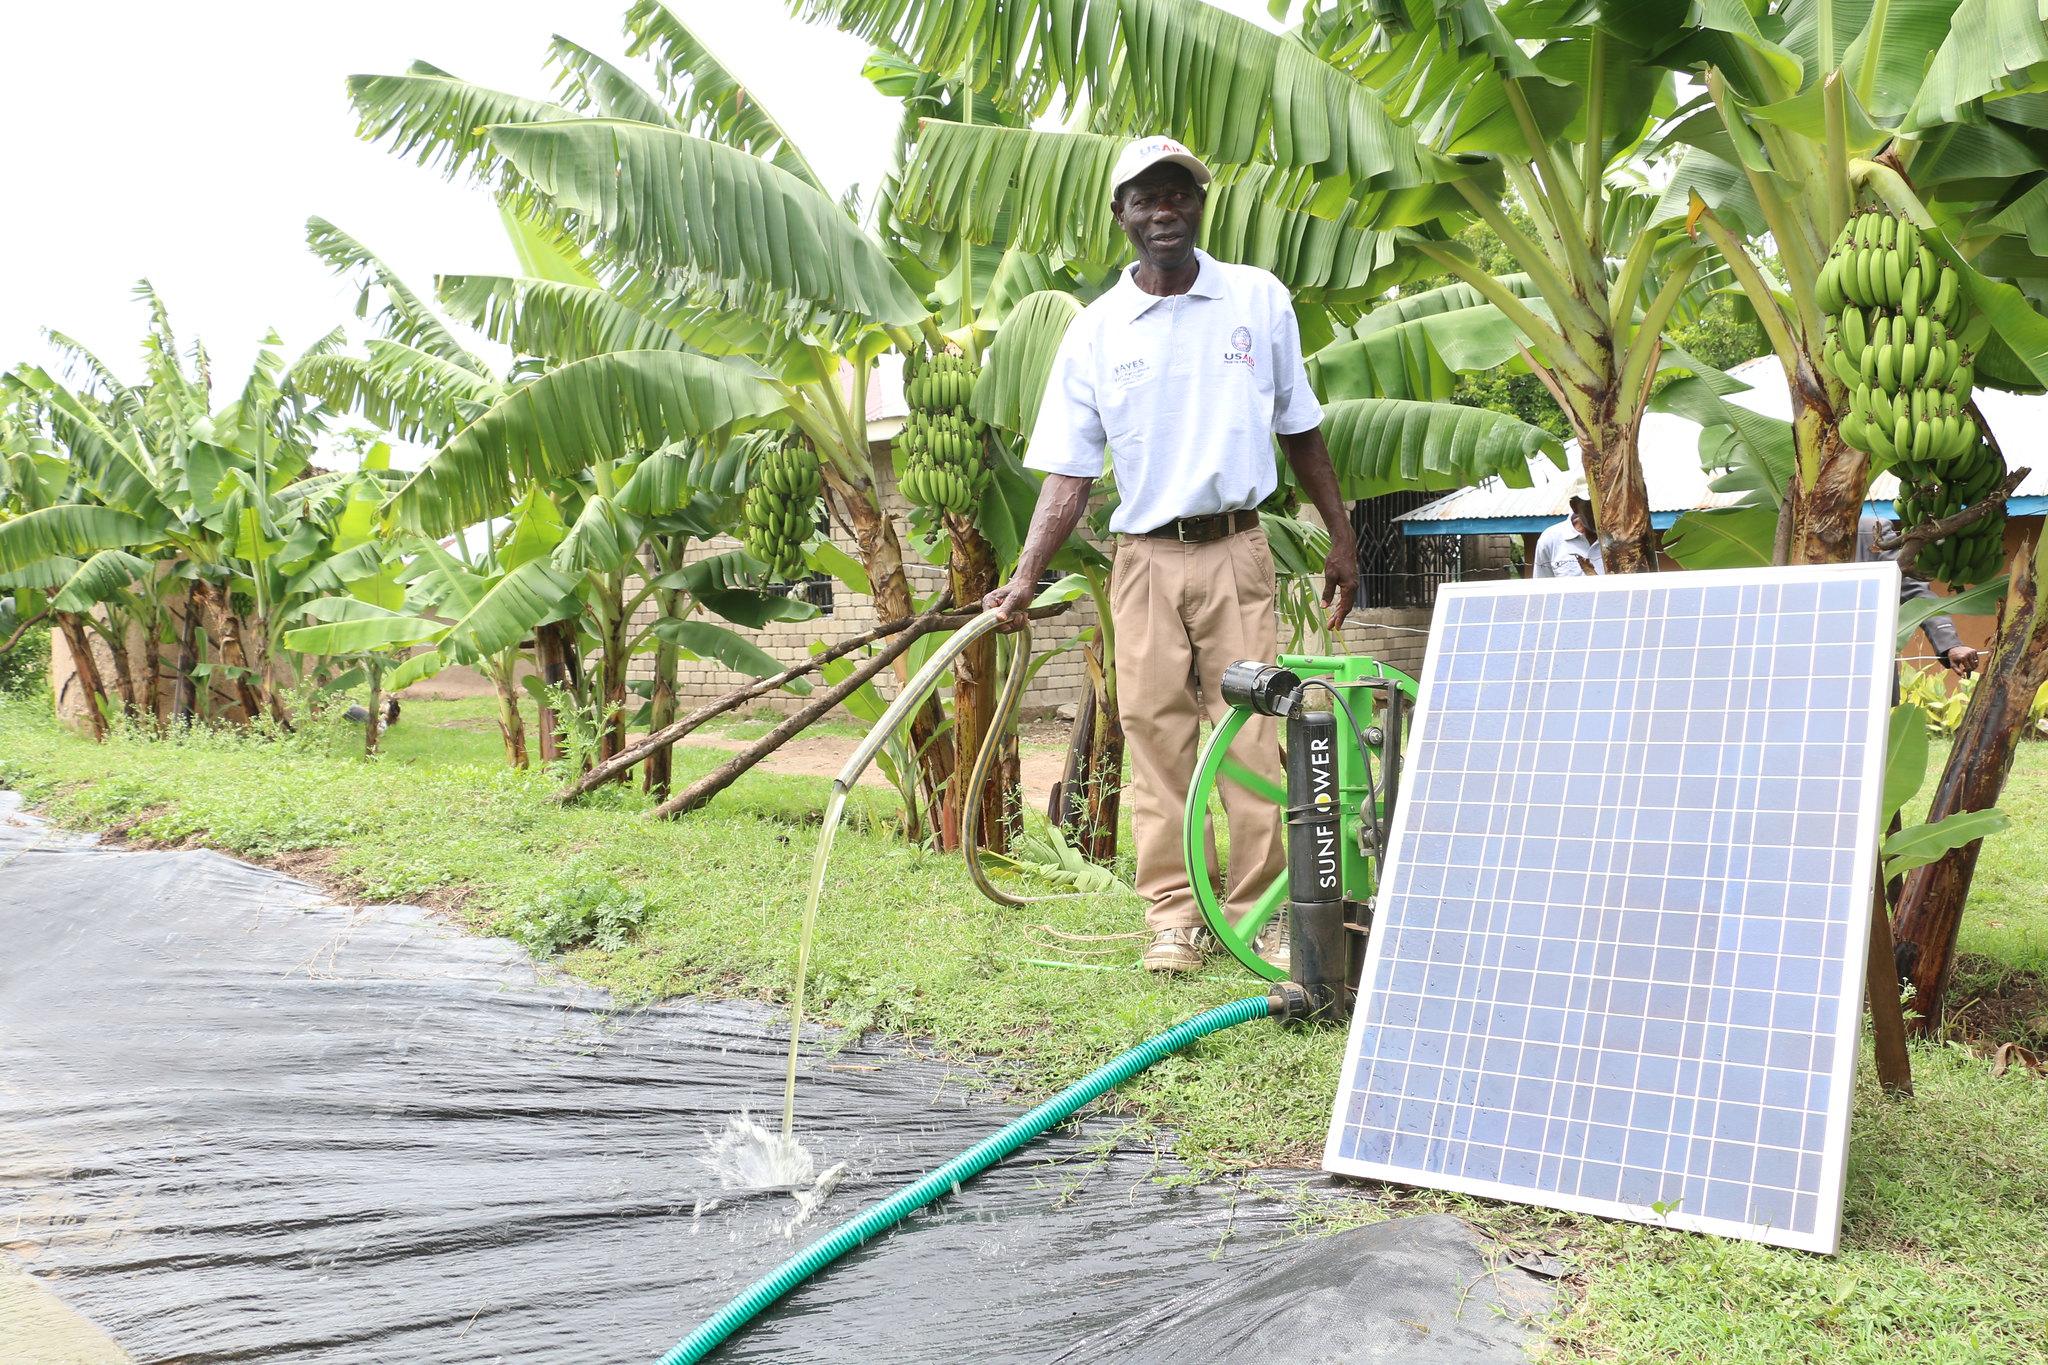 In photo: Joshua Okundi in Homa Bay County demonstrates usage of a solar pump.